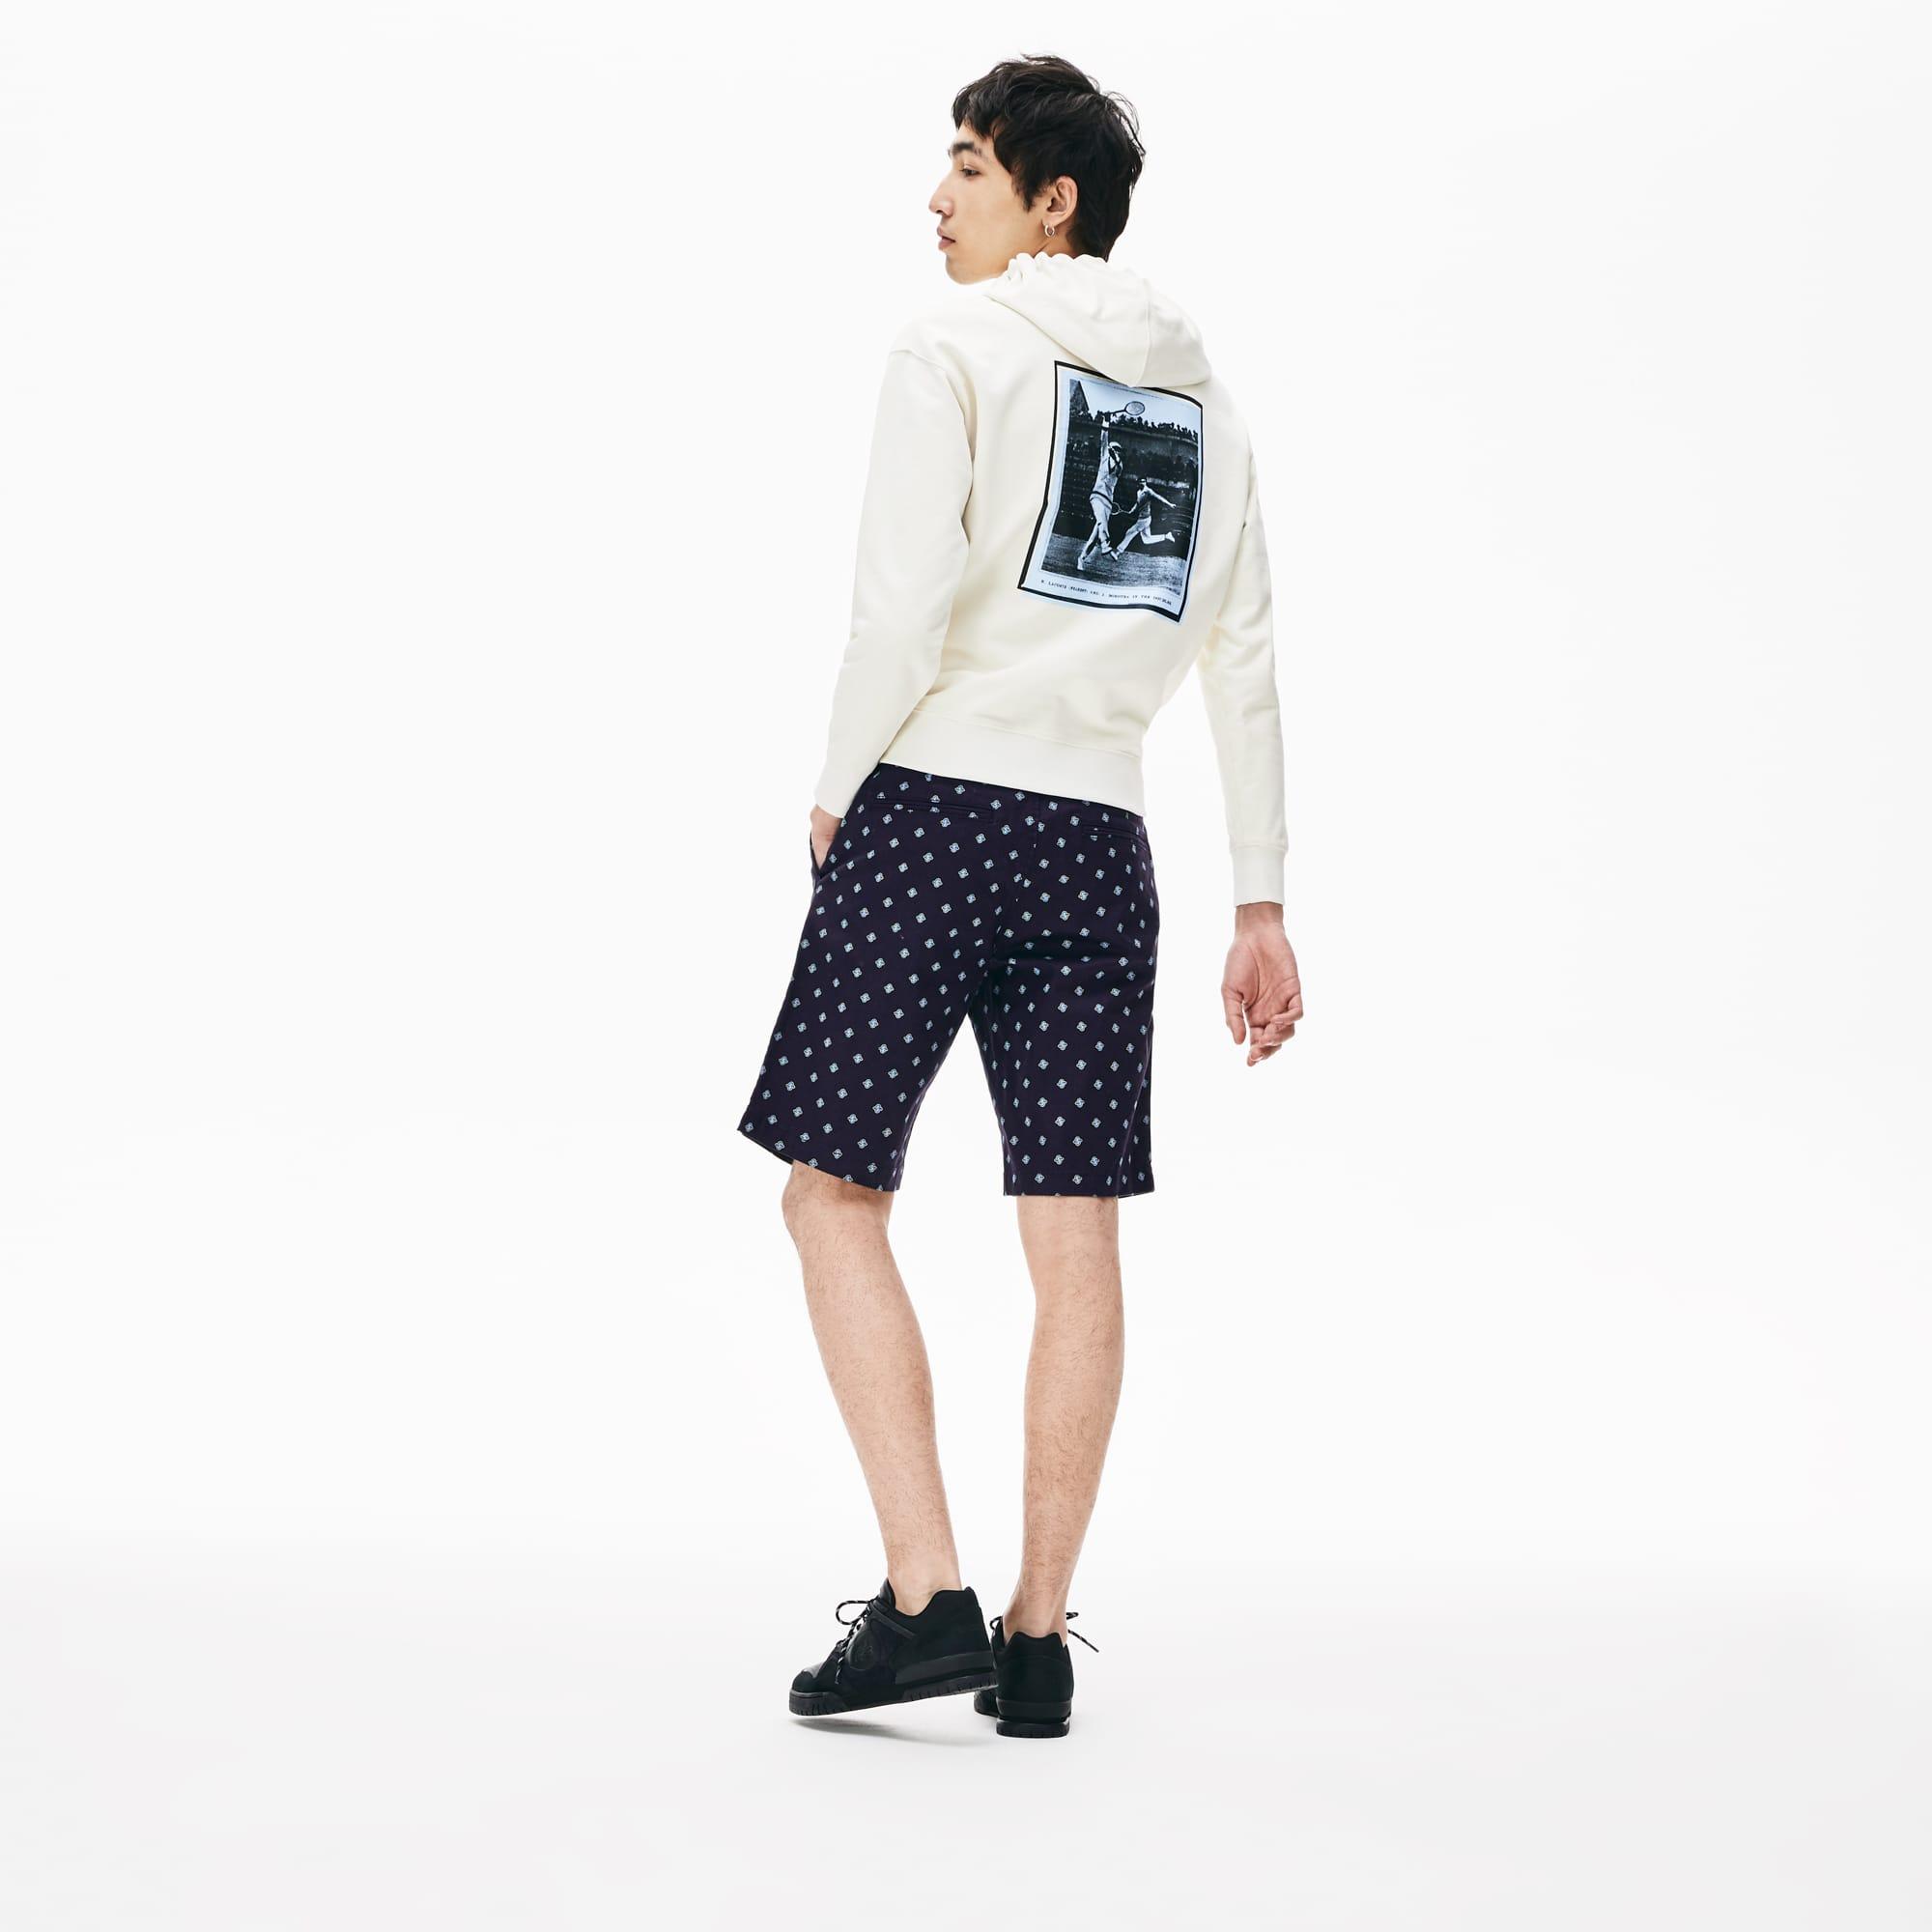 801c95ab25 Men's Lacoste LIVE Paisley Print Cotton Chino Bermuda Shorts   LACOSTE